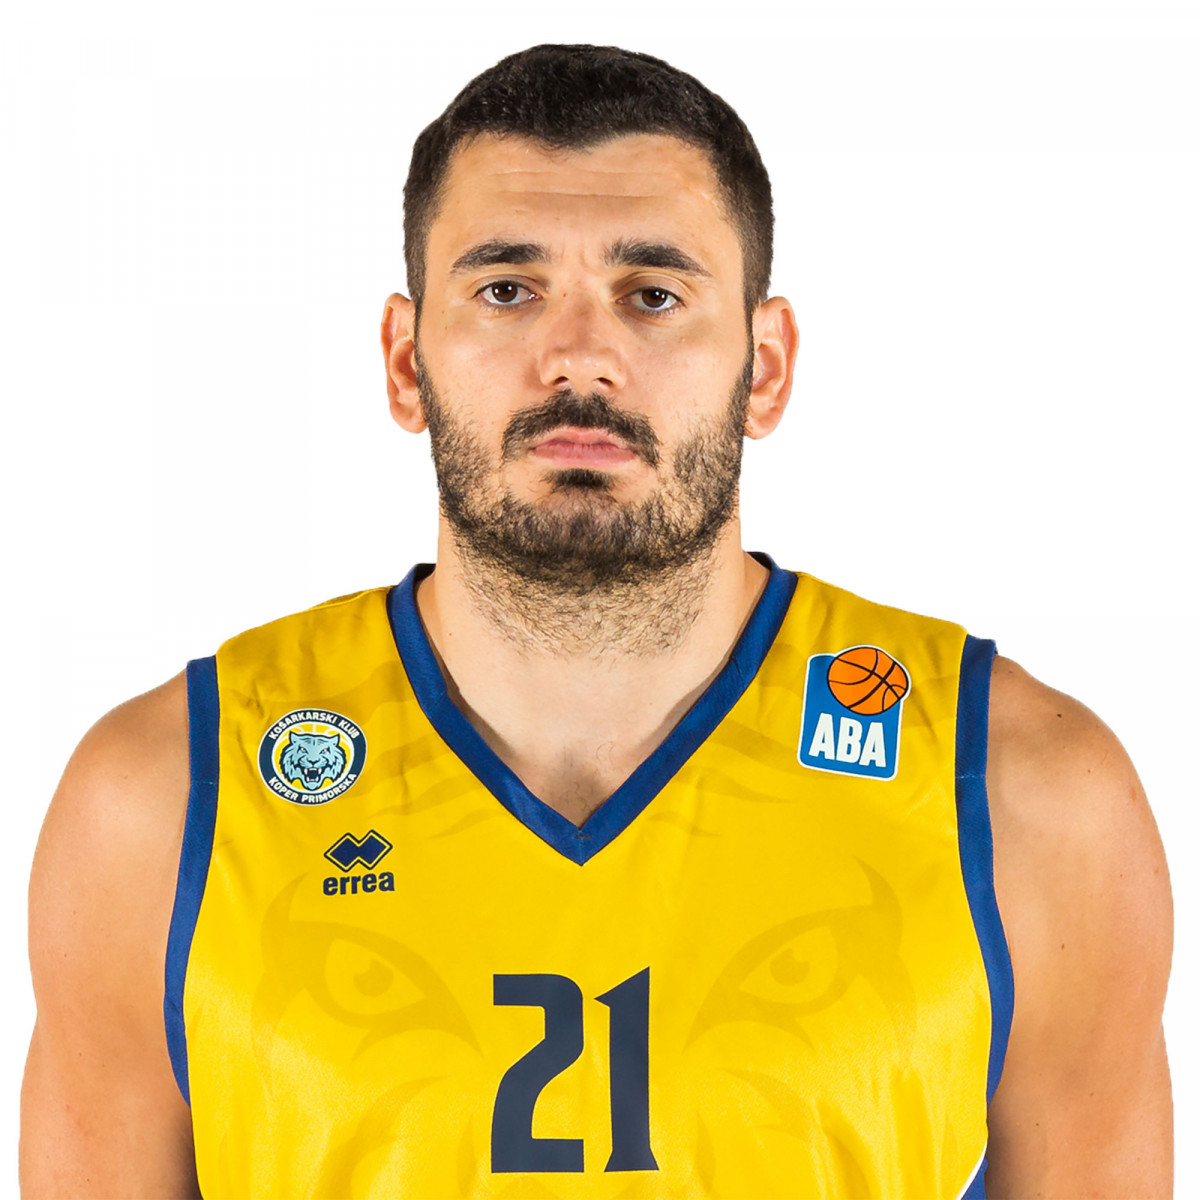 Photo of Marko Jagodic, 2019-2020 season